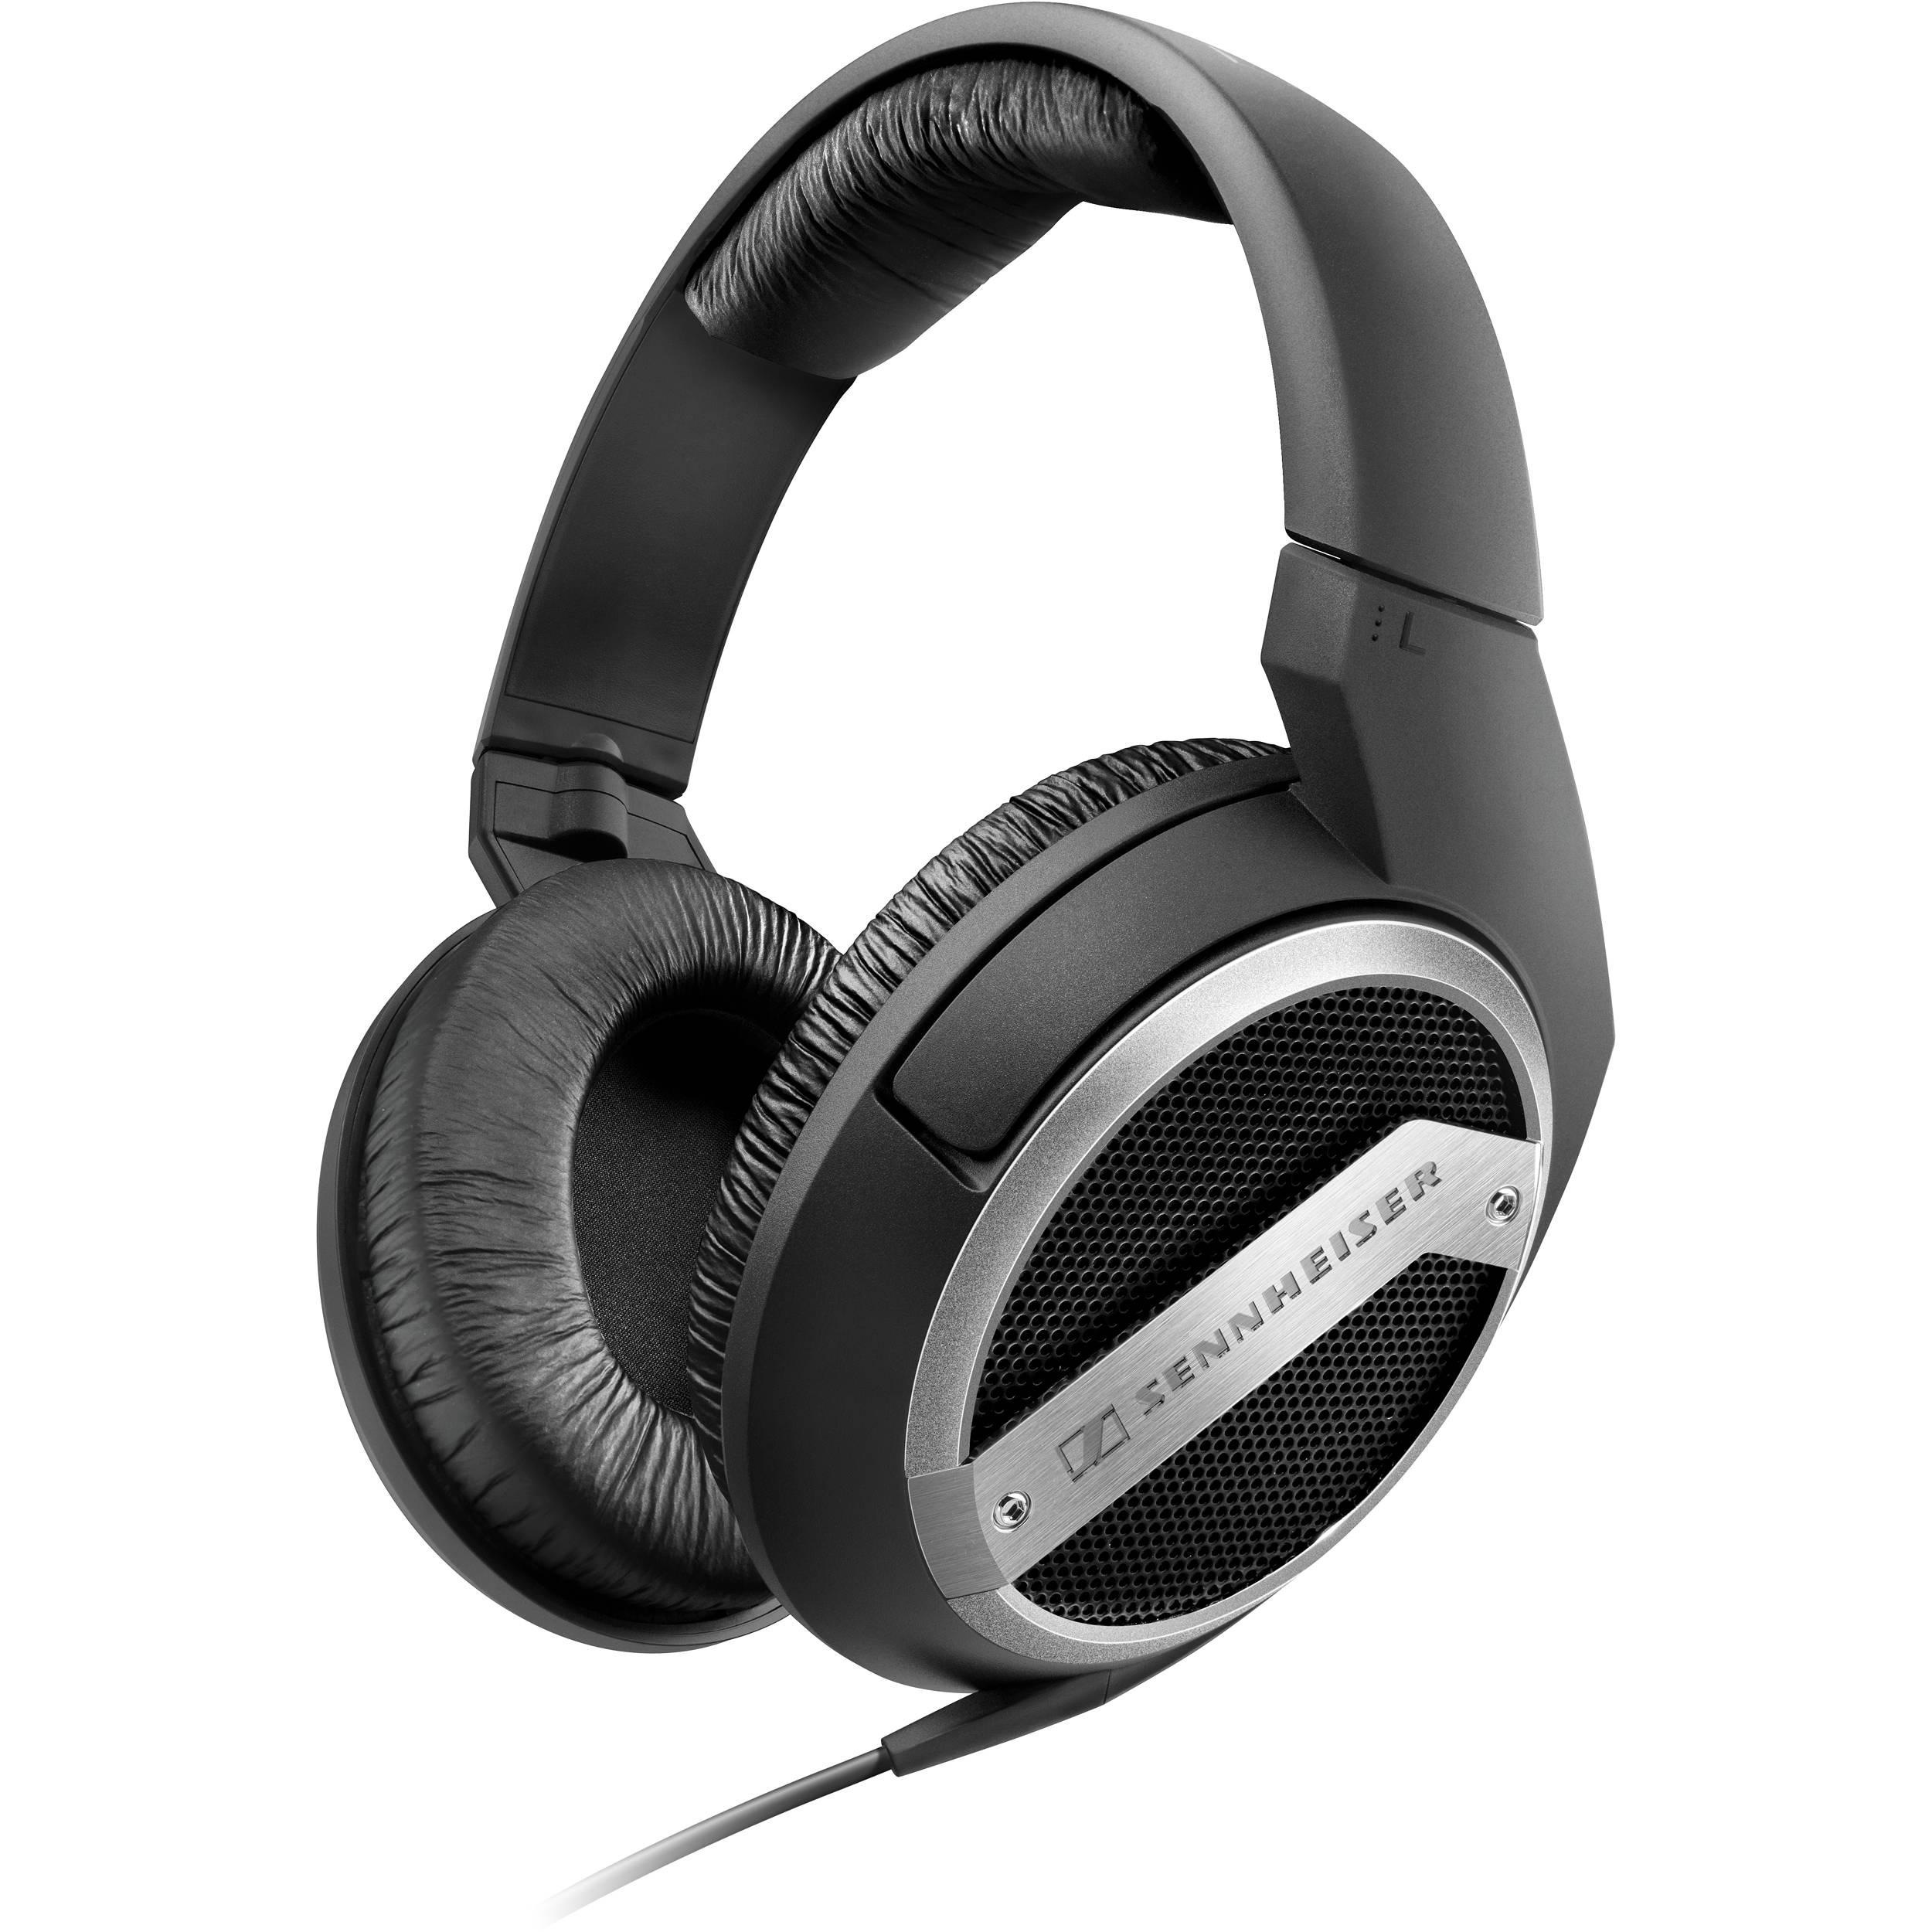 Sennheiser Hd 449 Around Ear Stereo